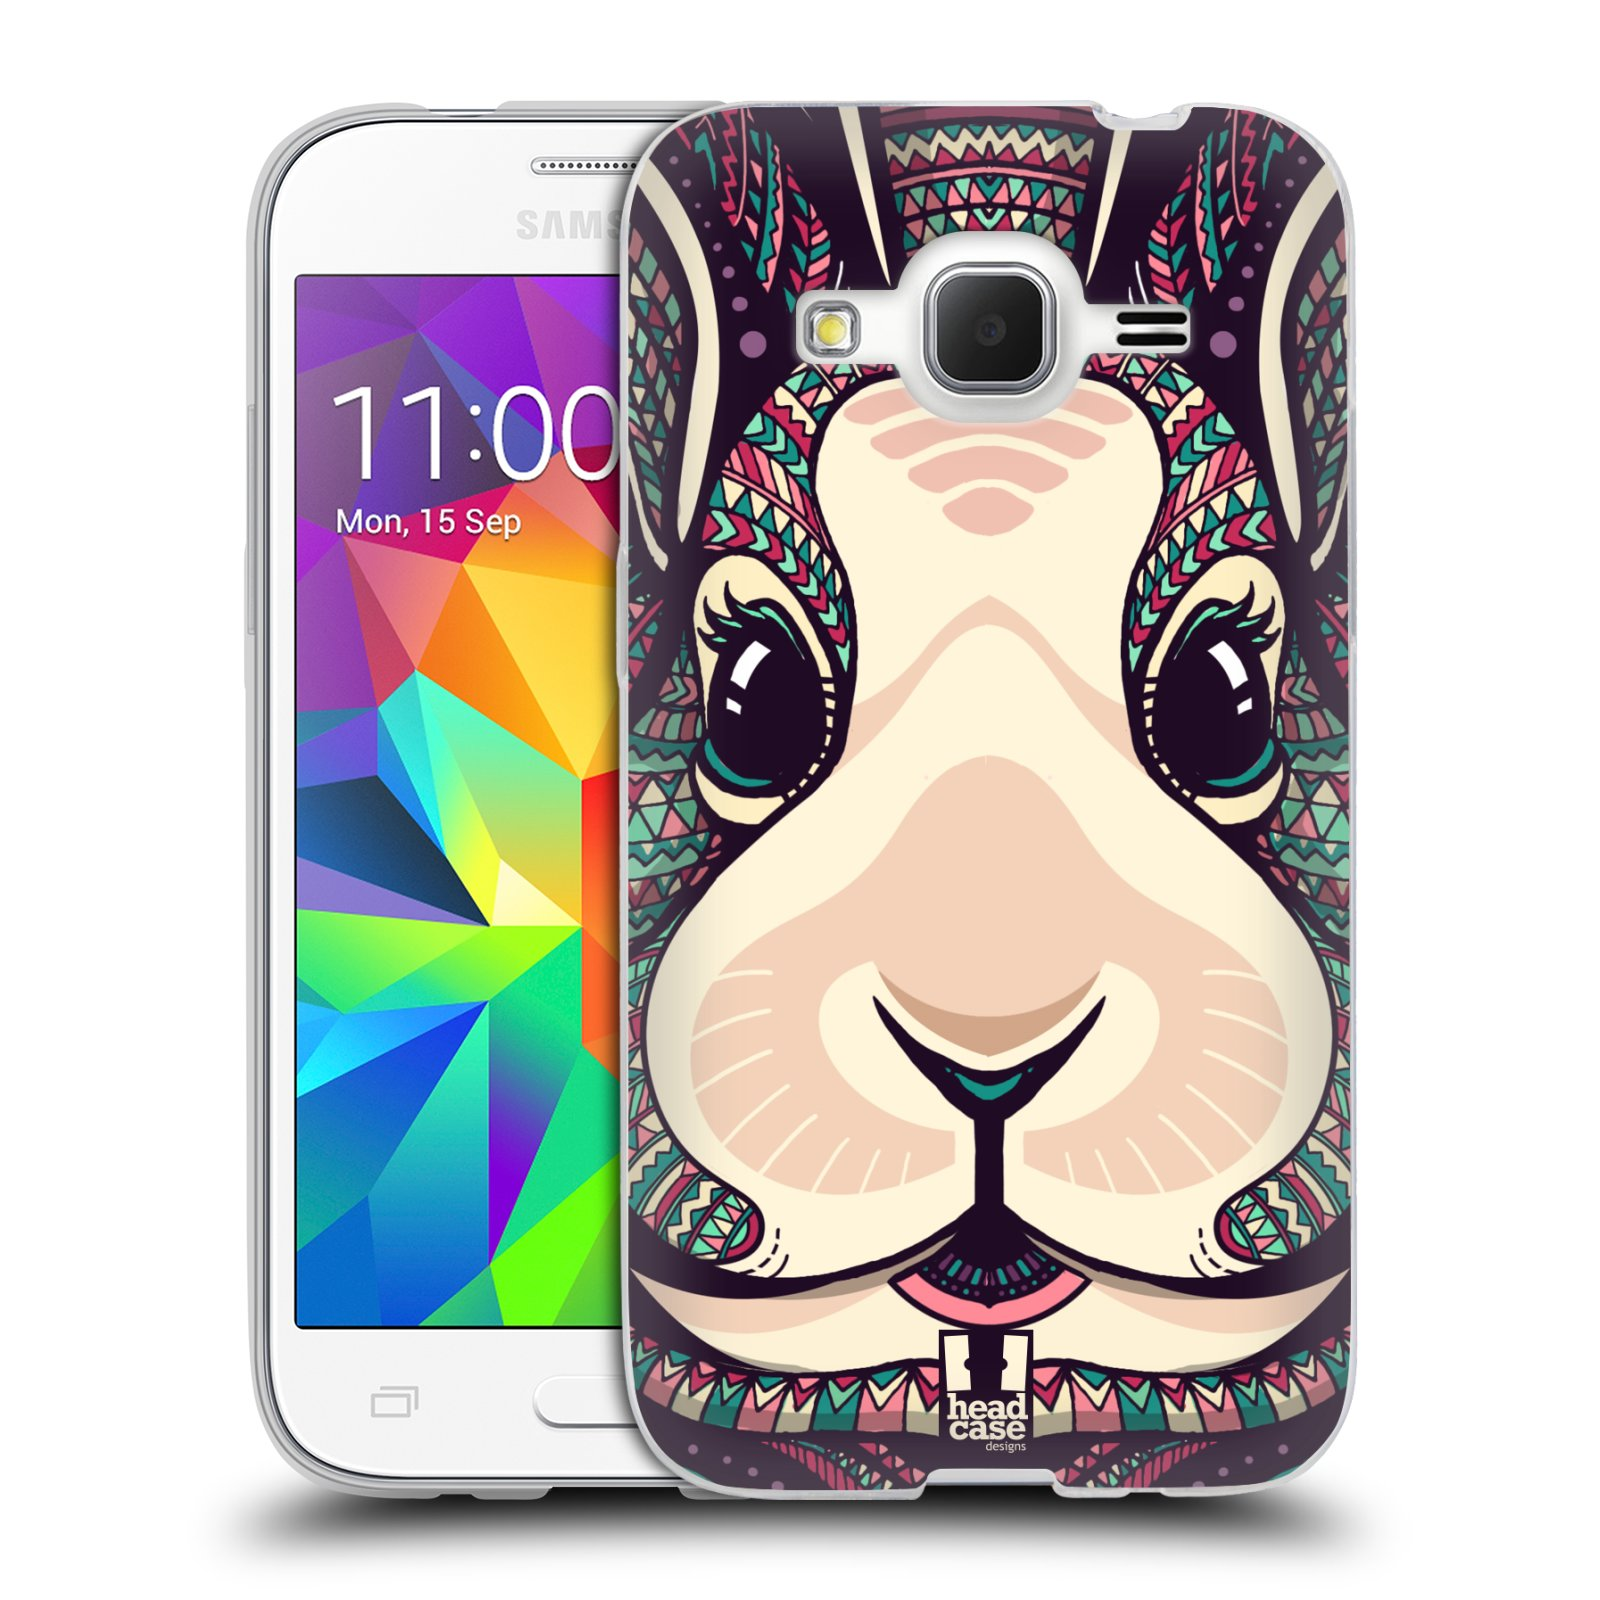 Silikonové pouzdro na mobil Samsung Galaxy Core Prime LTE HEAD CASE AZTEC ZAJÍČEK